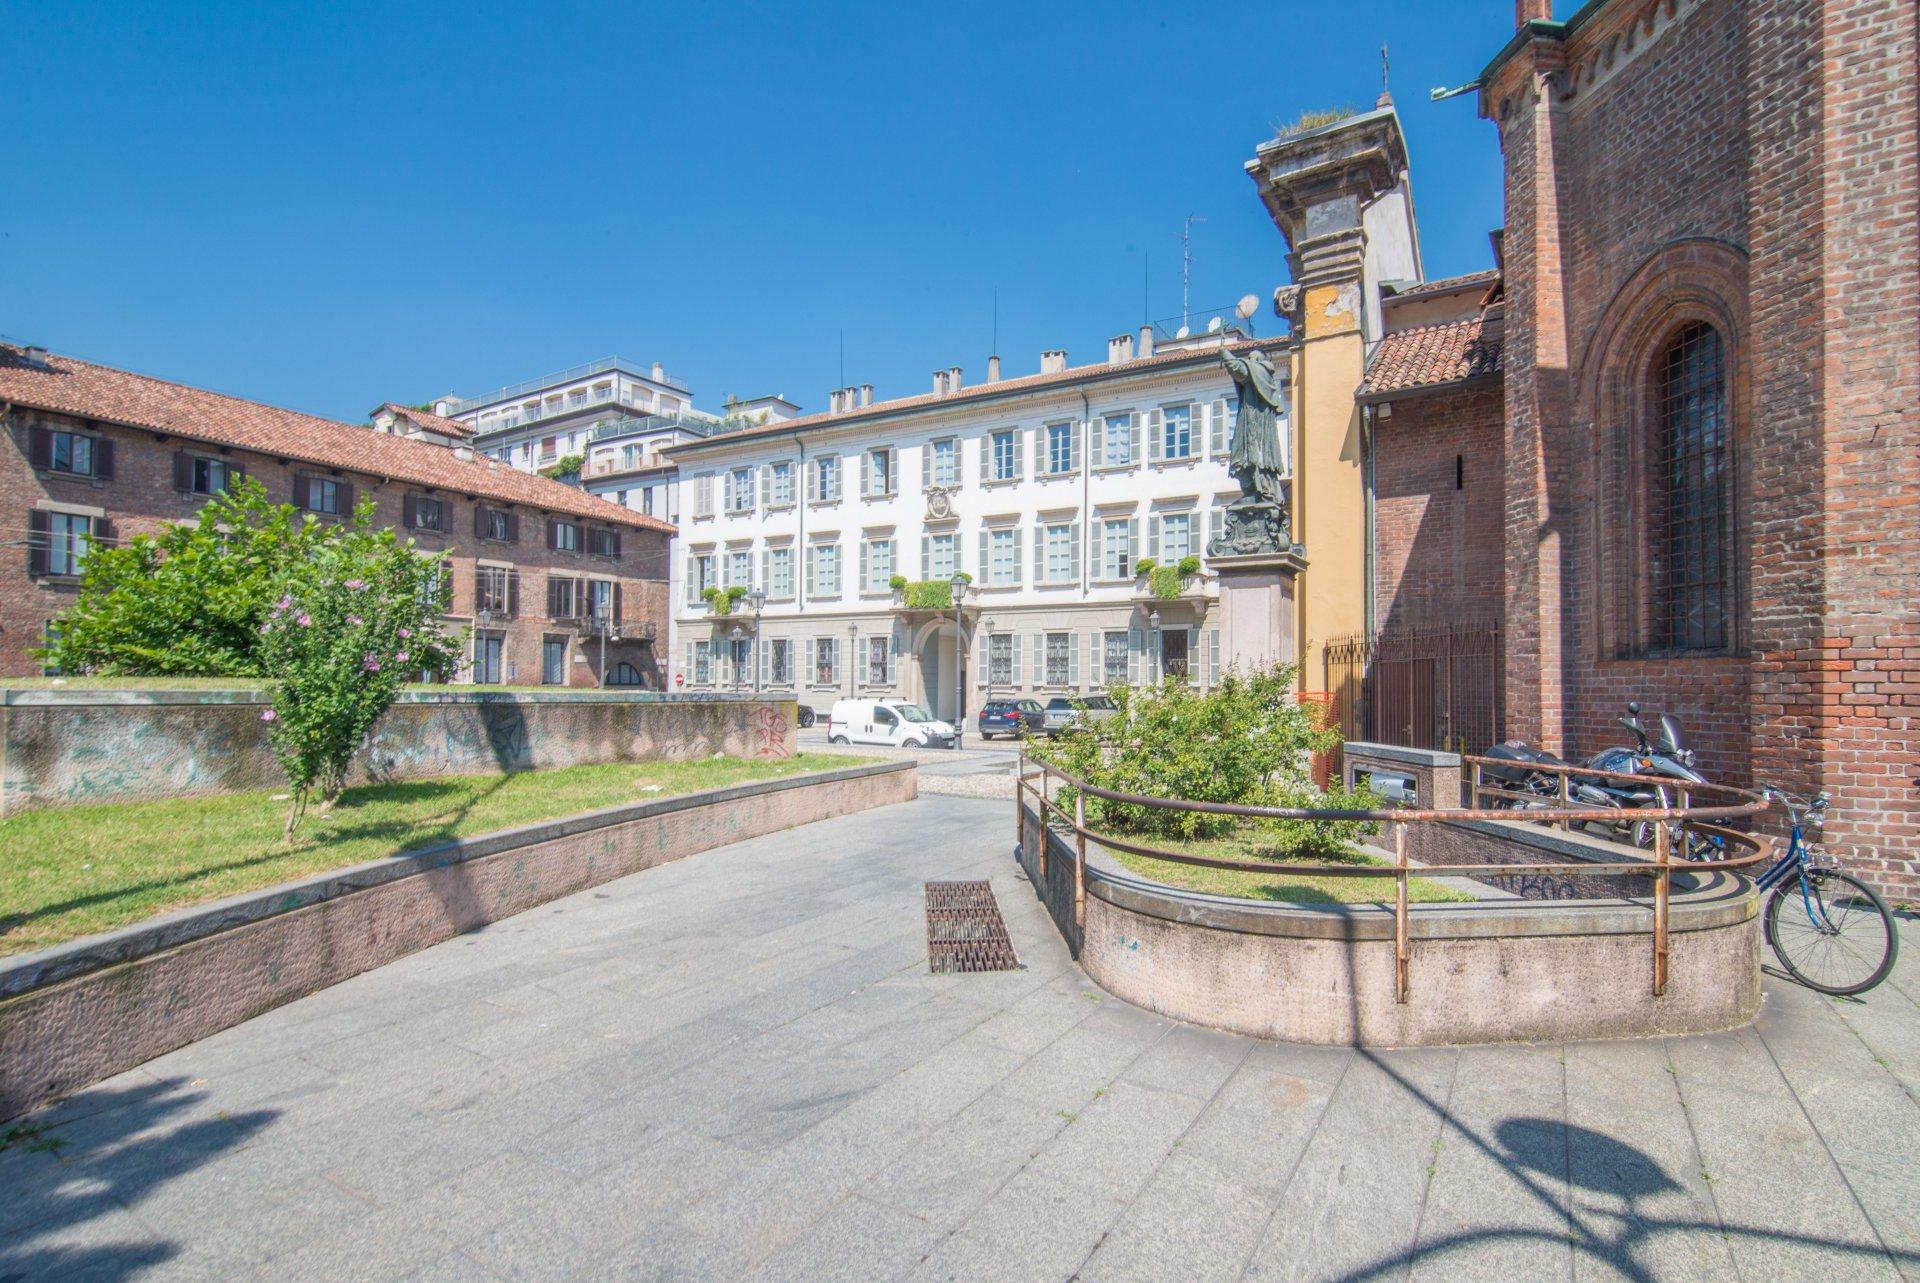 Annuncio Vendita Appartamento Milano Corso Magenta (20100 ...